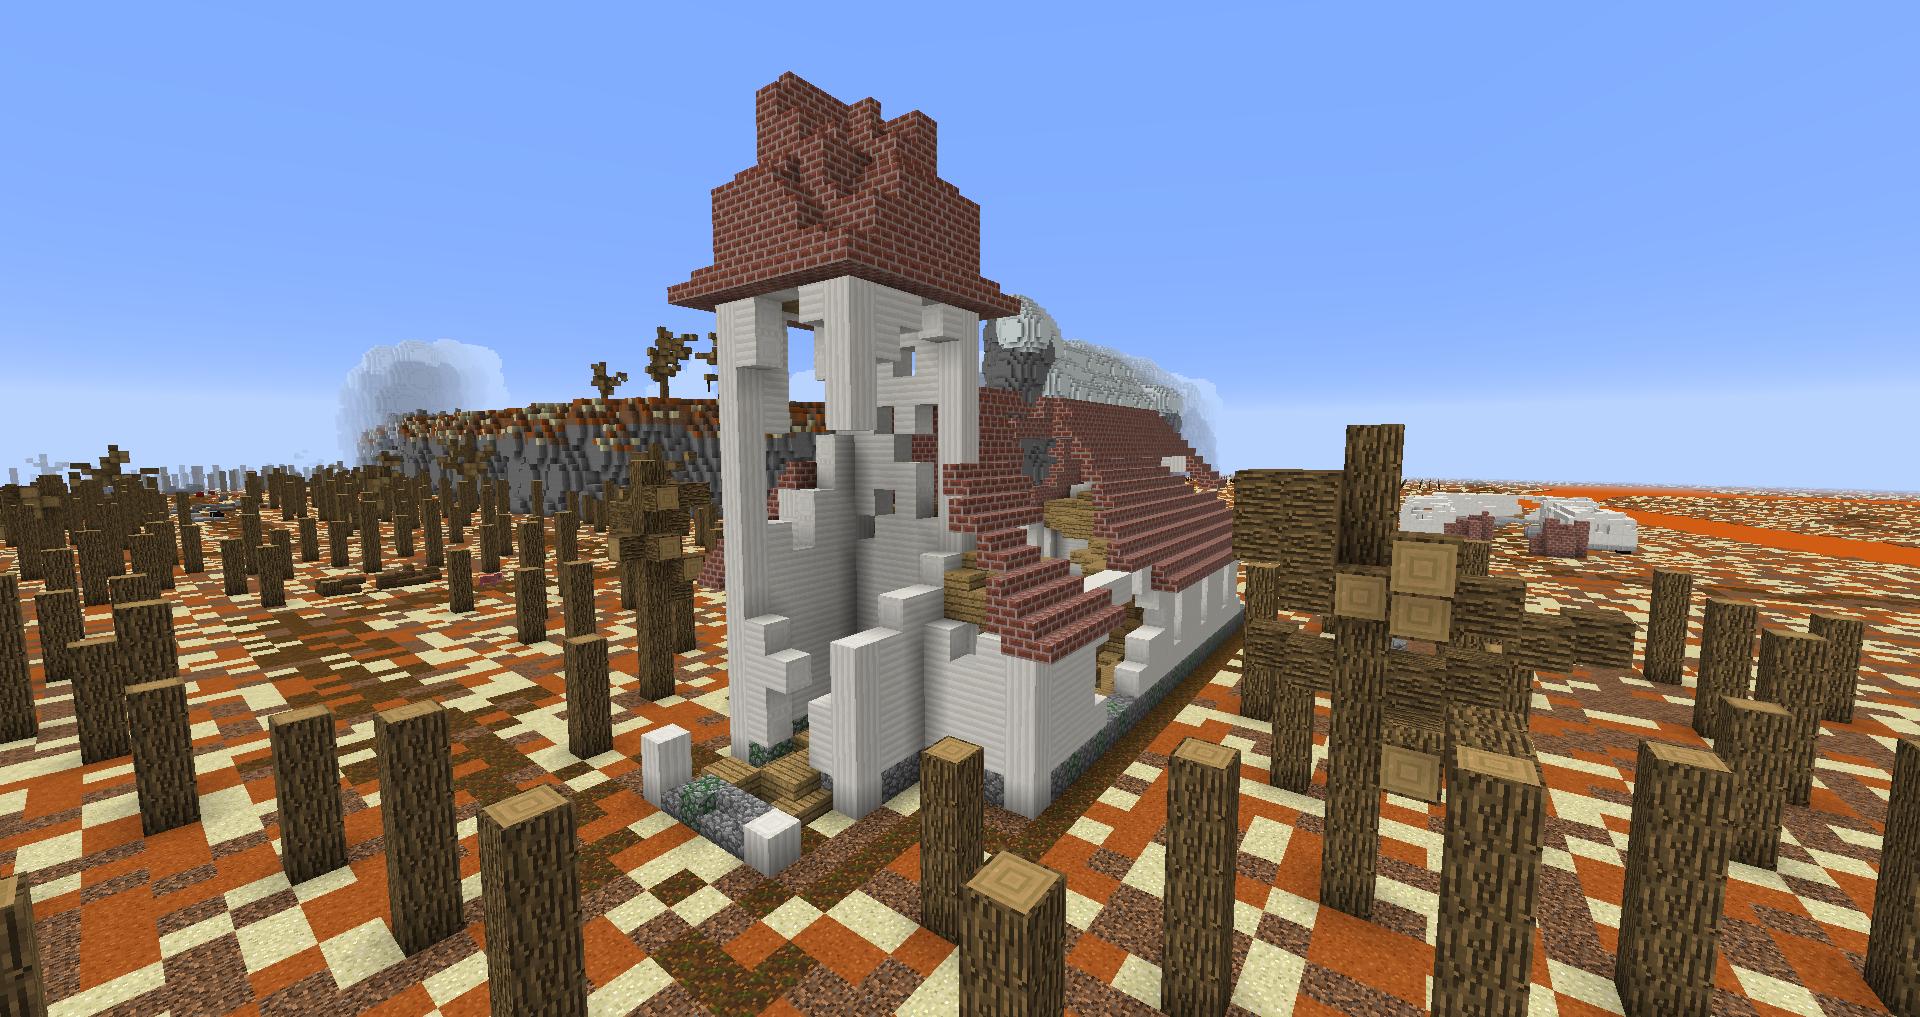 minecraft zombie apocalypse map 1.12.2 download